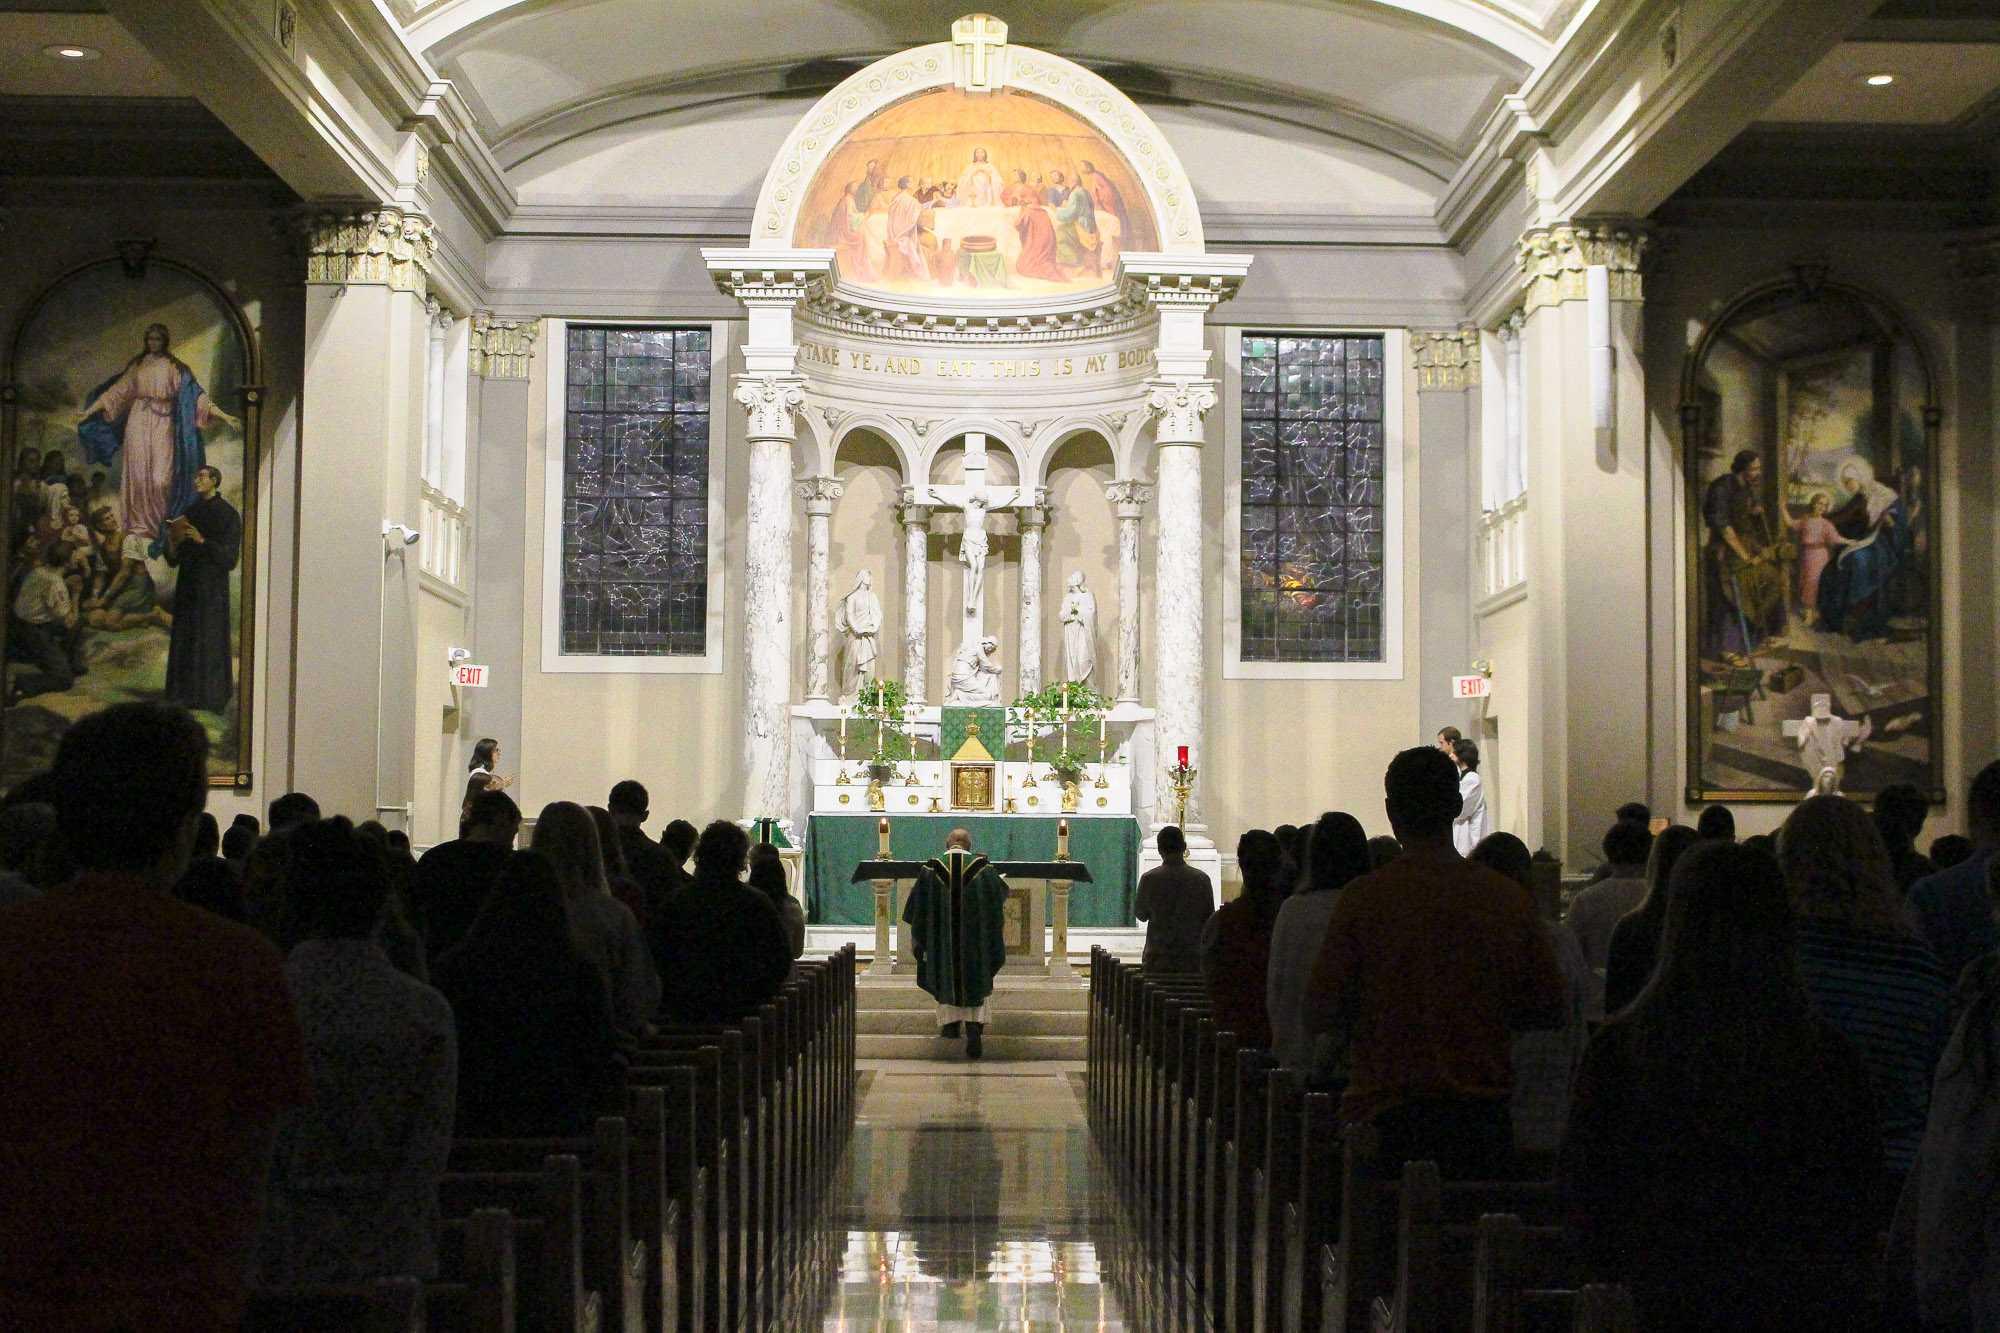 Sunday night mass begins at St. John's Catholic Newman Center.